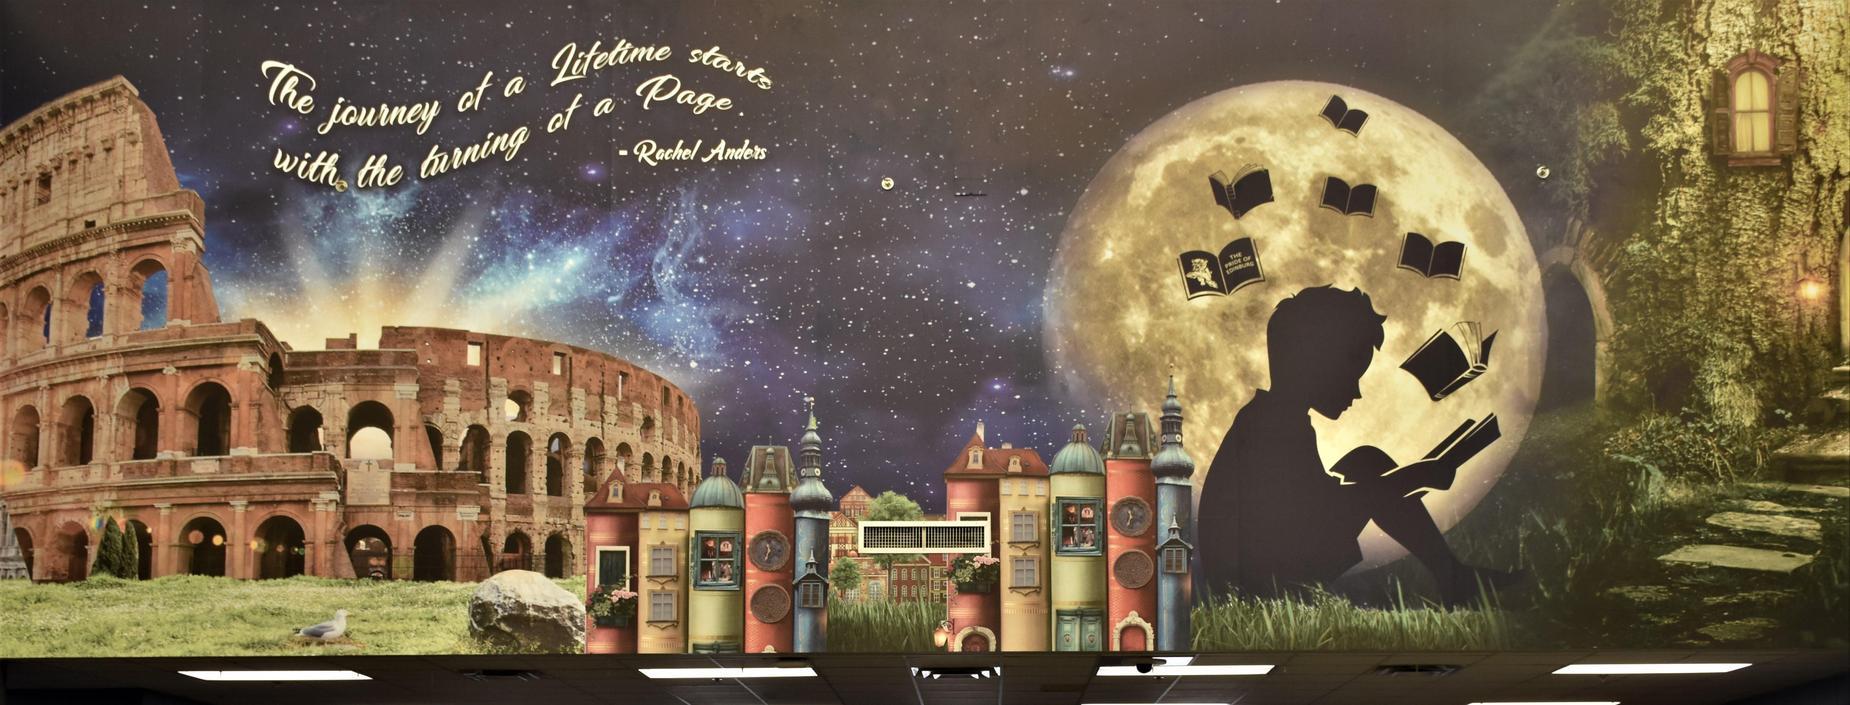 Bobcat Library Mural